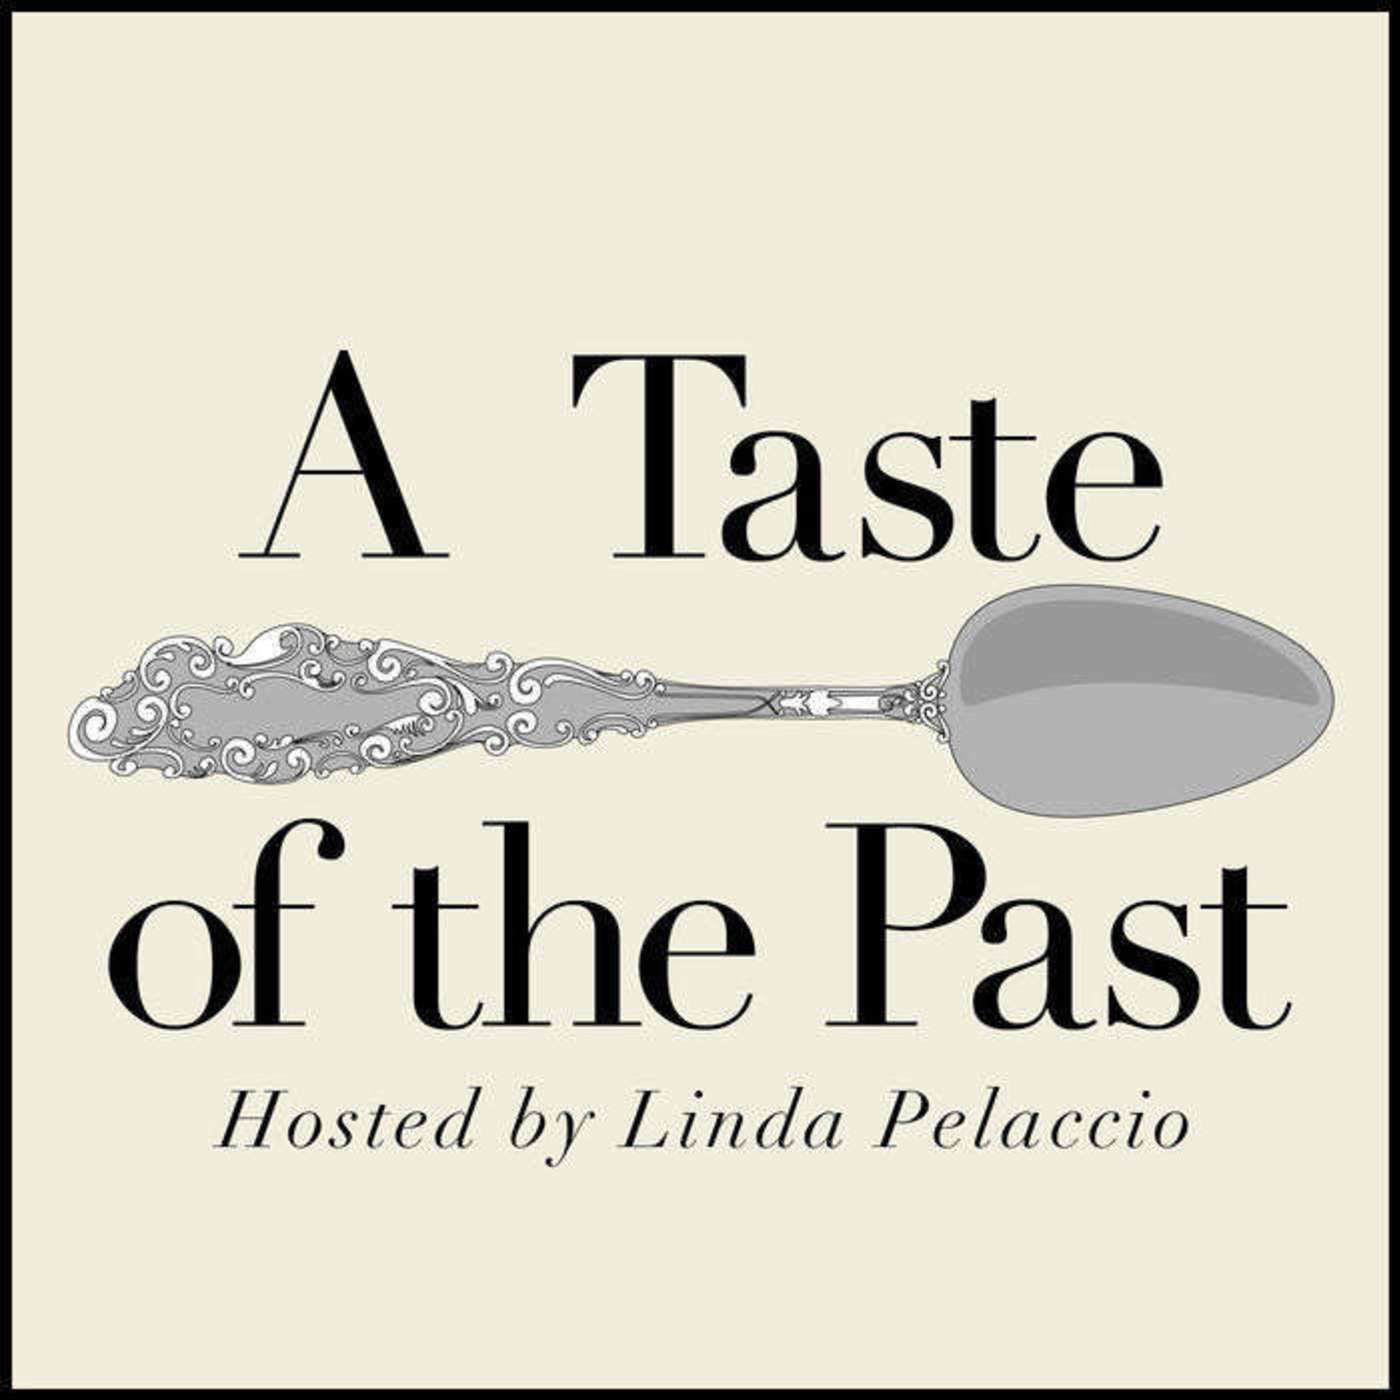 Episode 206: Roman Food Culture